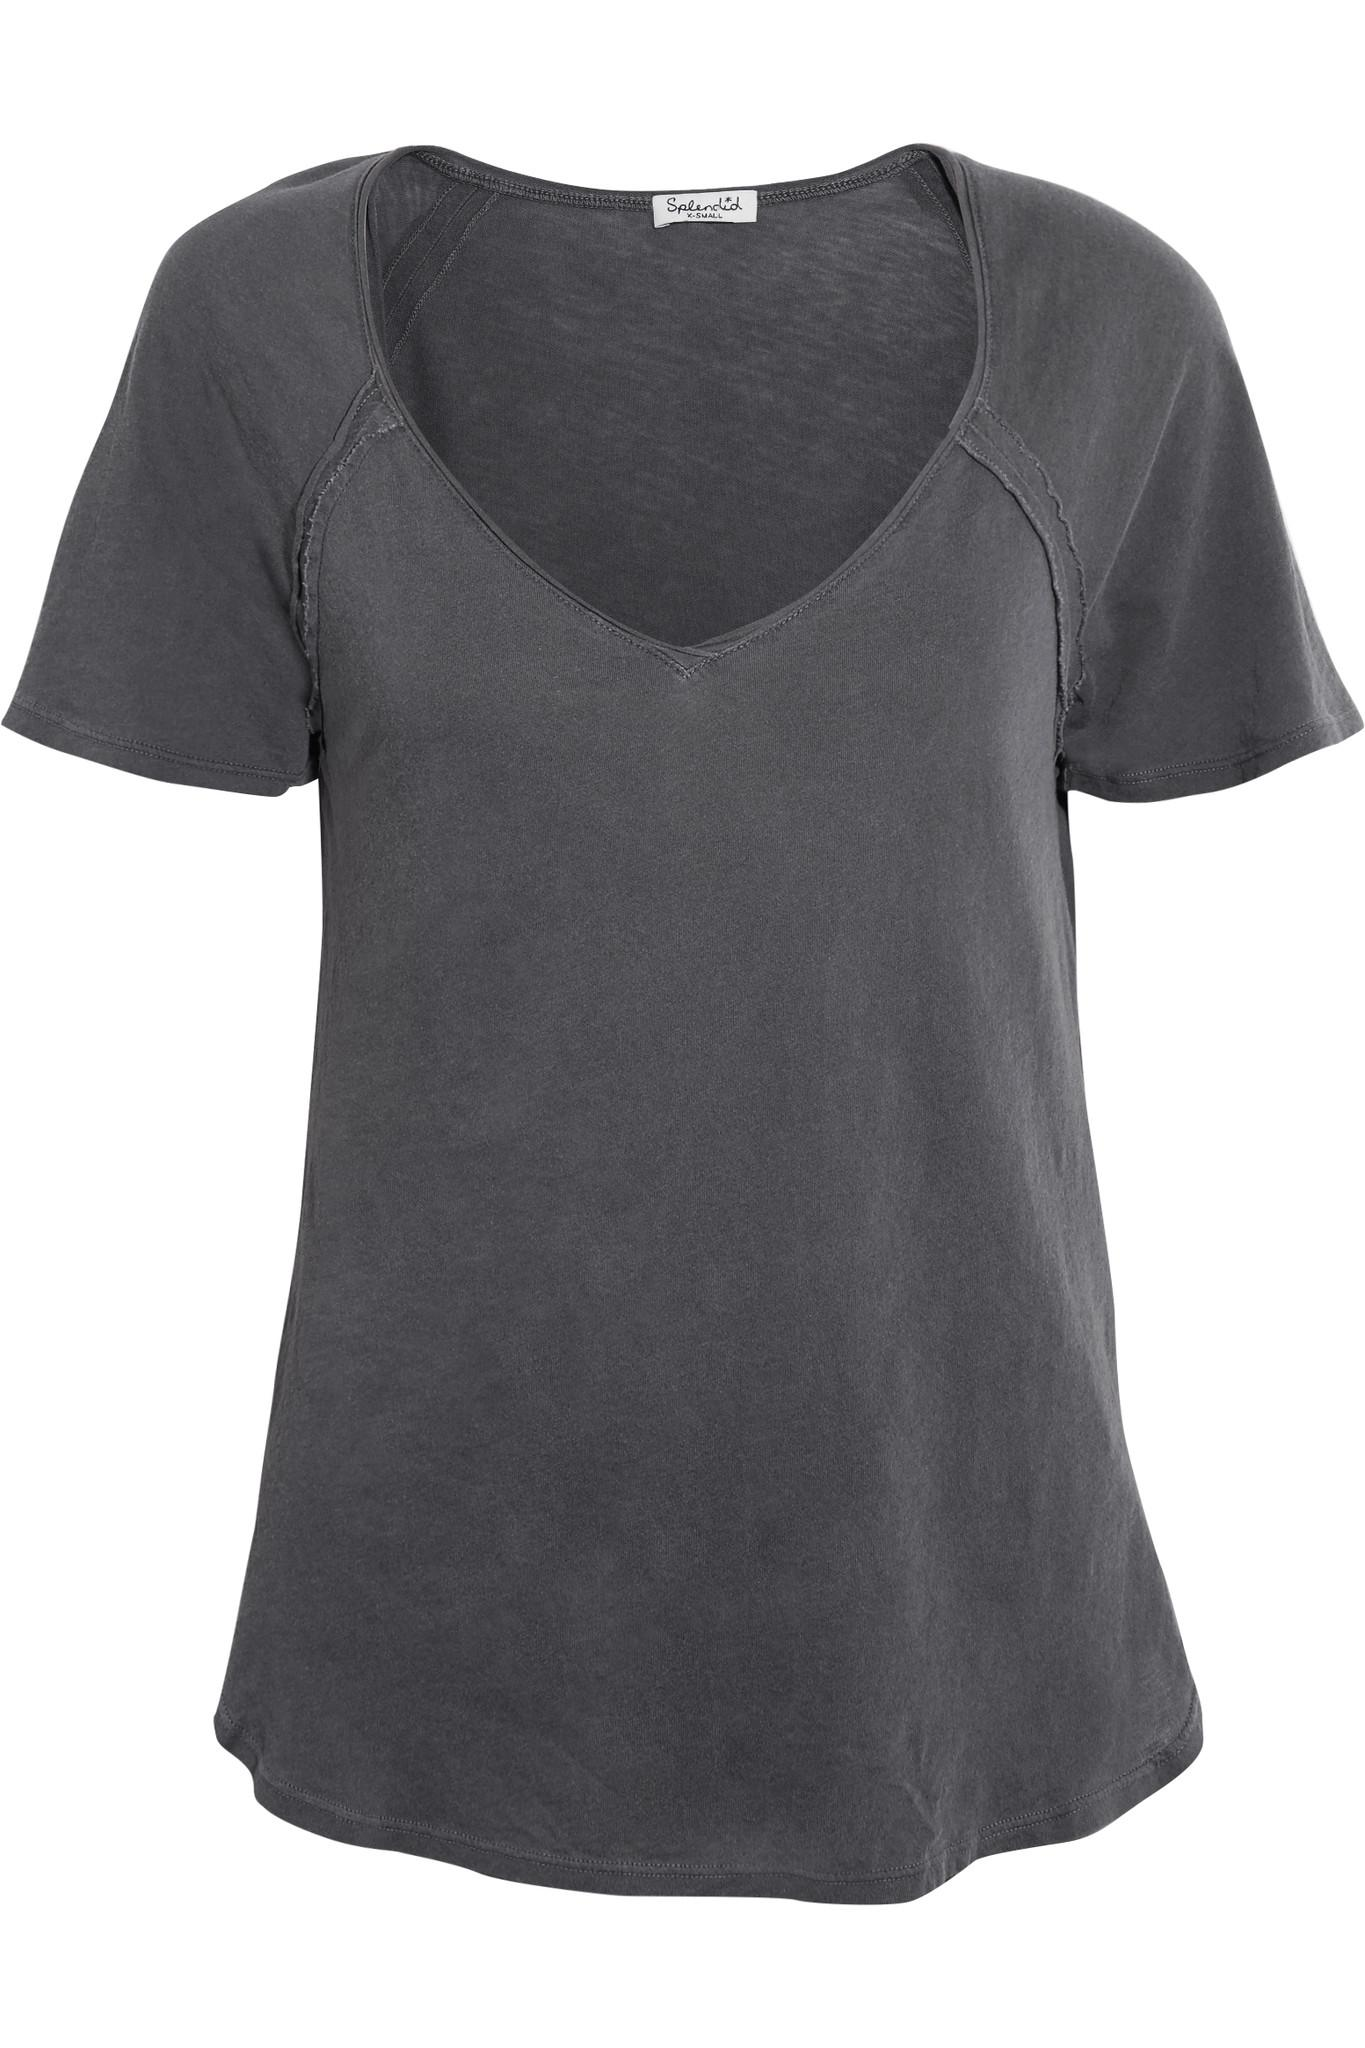 Lyst splendid supima cotton t shirt in gray for Supima cotton dress shirts